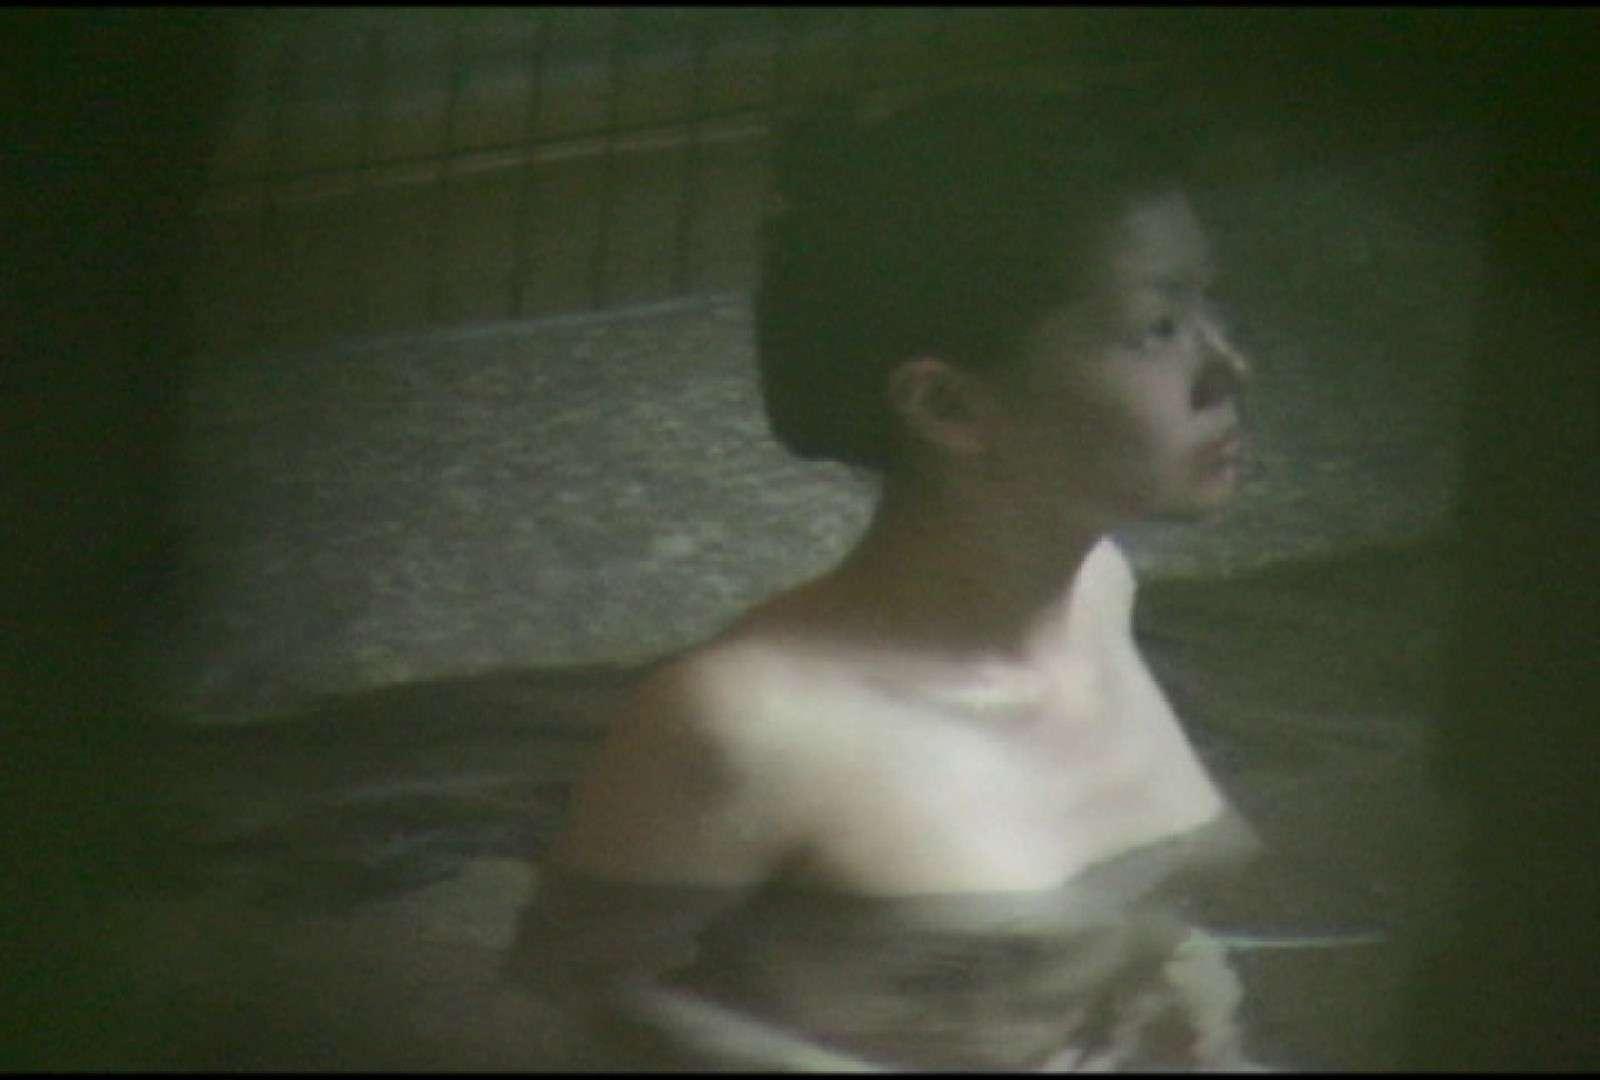 Aquaな露天風呂Vol.699 美しいOLの裸体 | 露天風呂突入  101pic 1